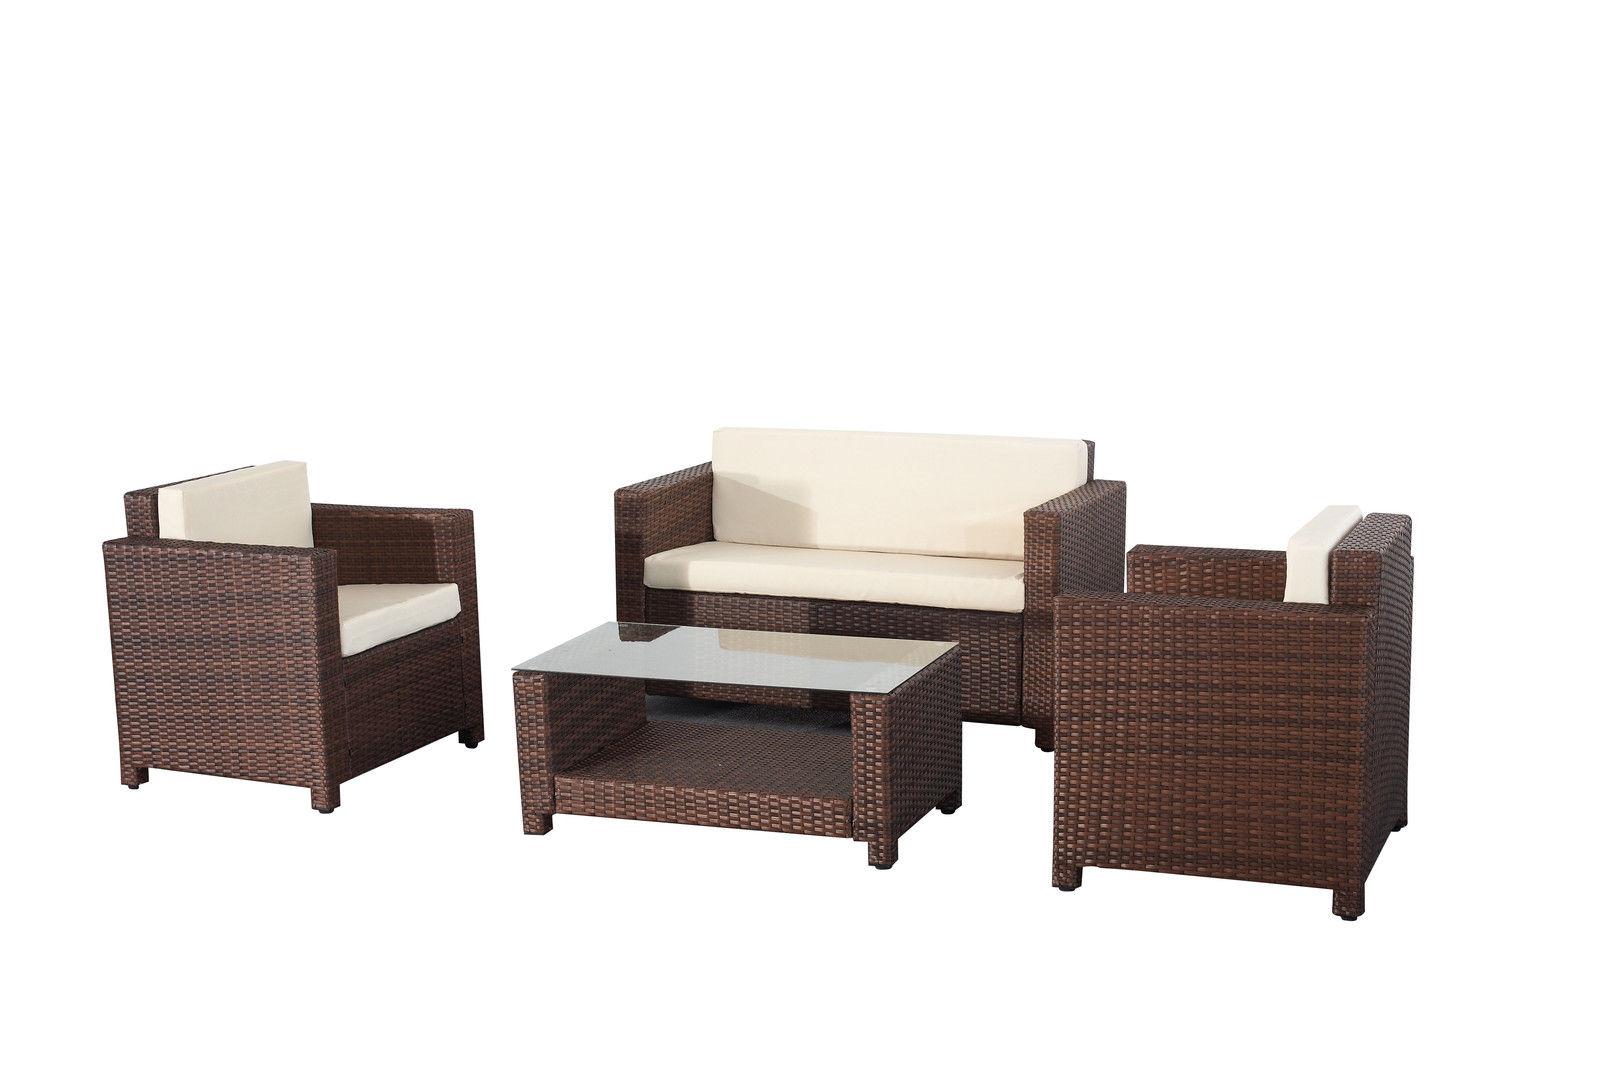 Brown Garden Furniture Sets: Evre Rome 4PCS Weatherproof Outdoor Furniture Set